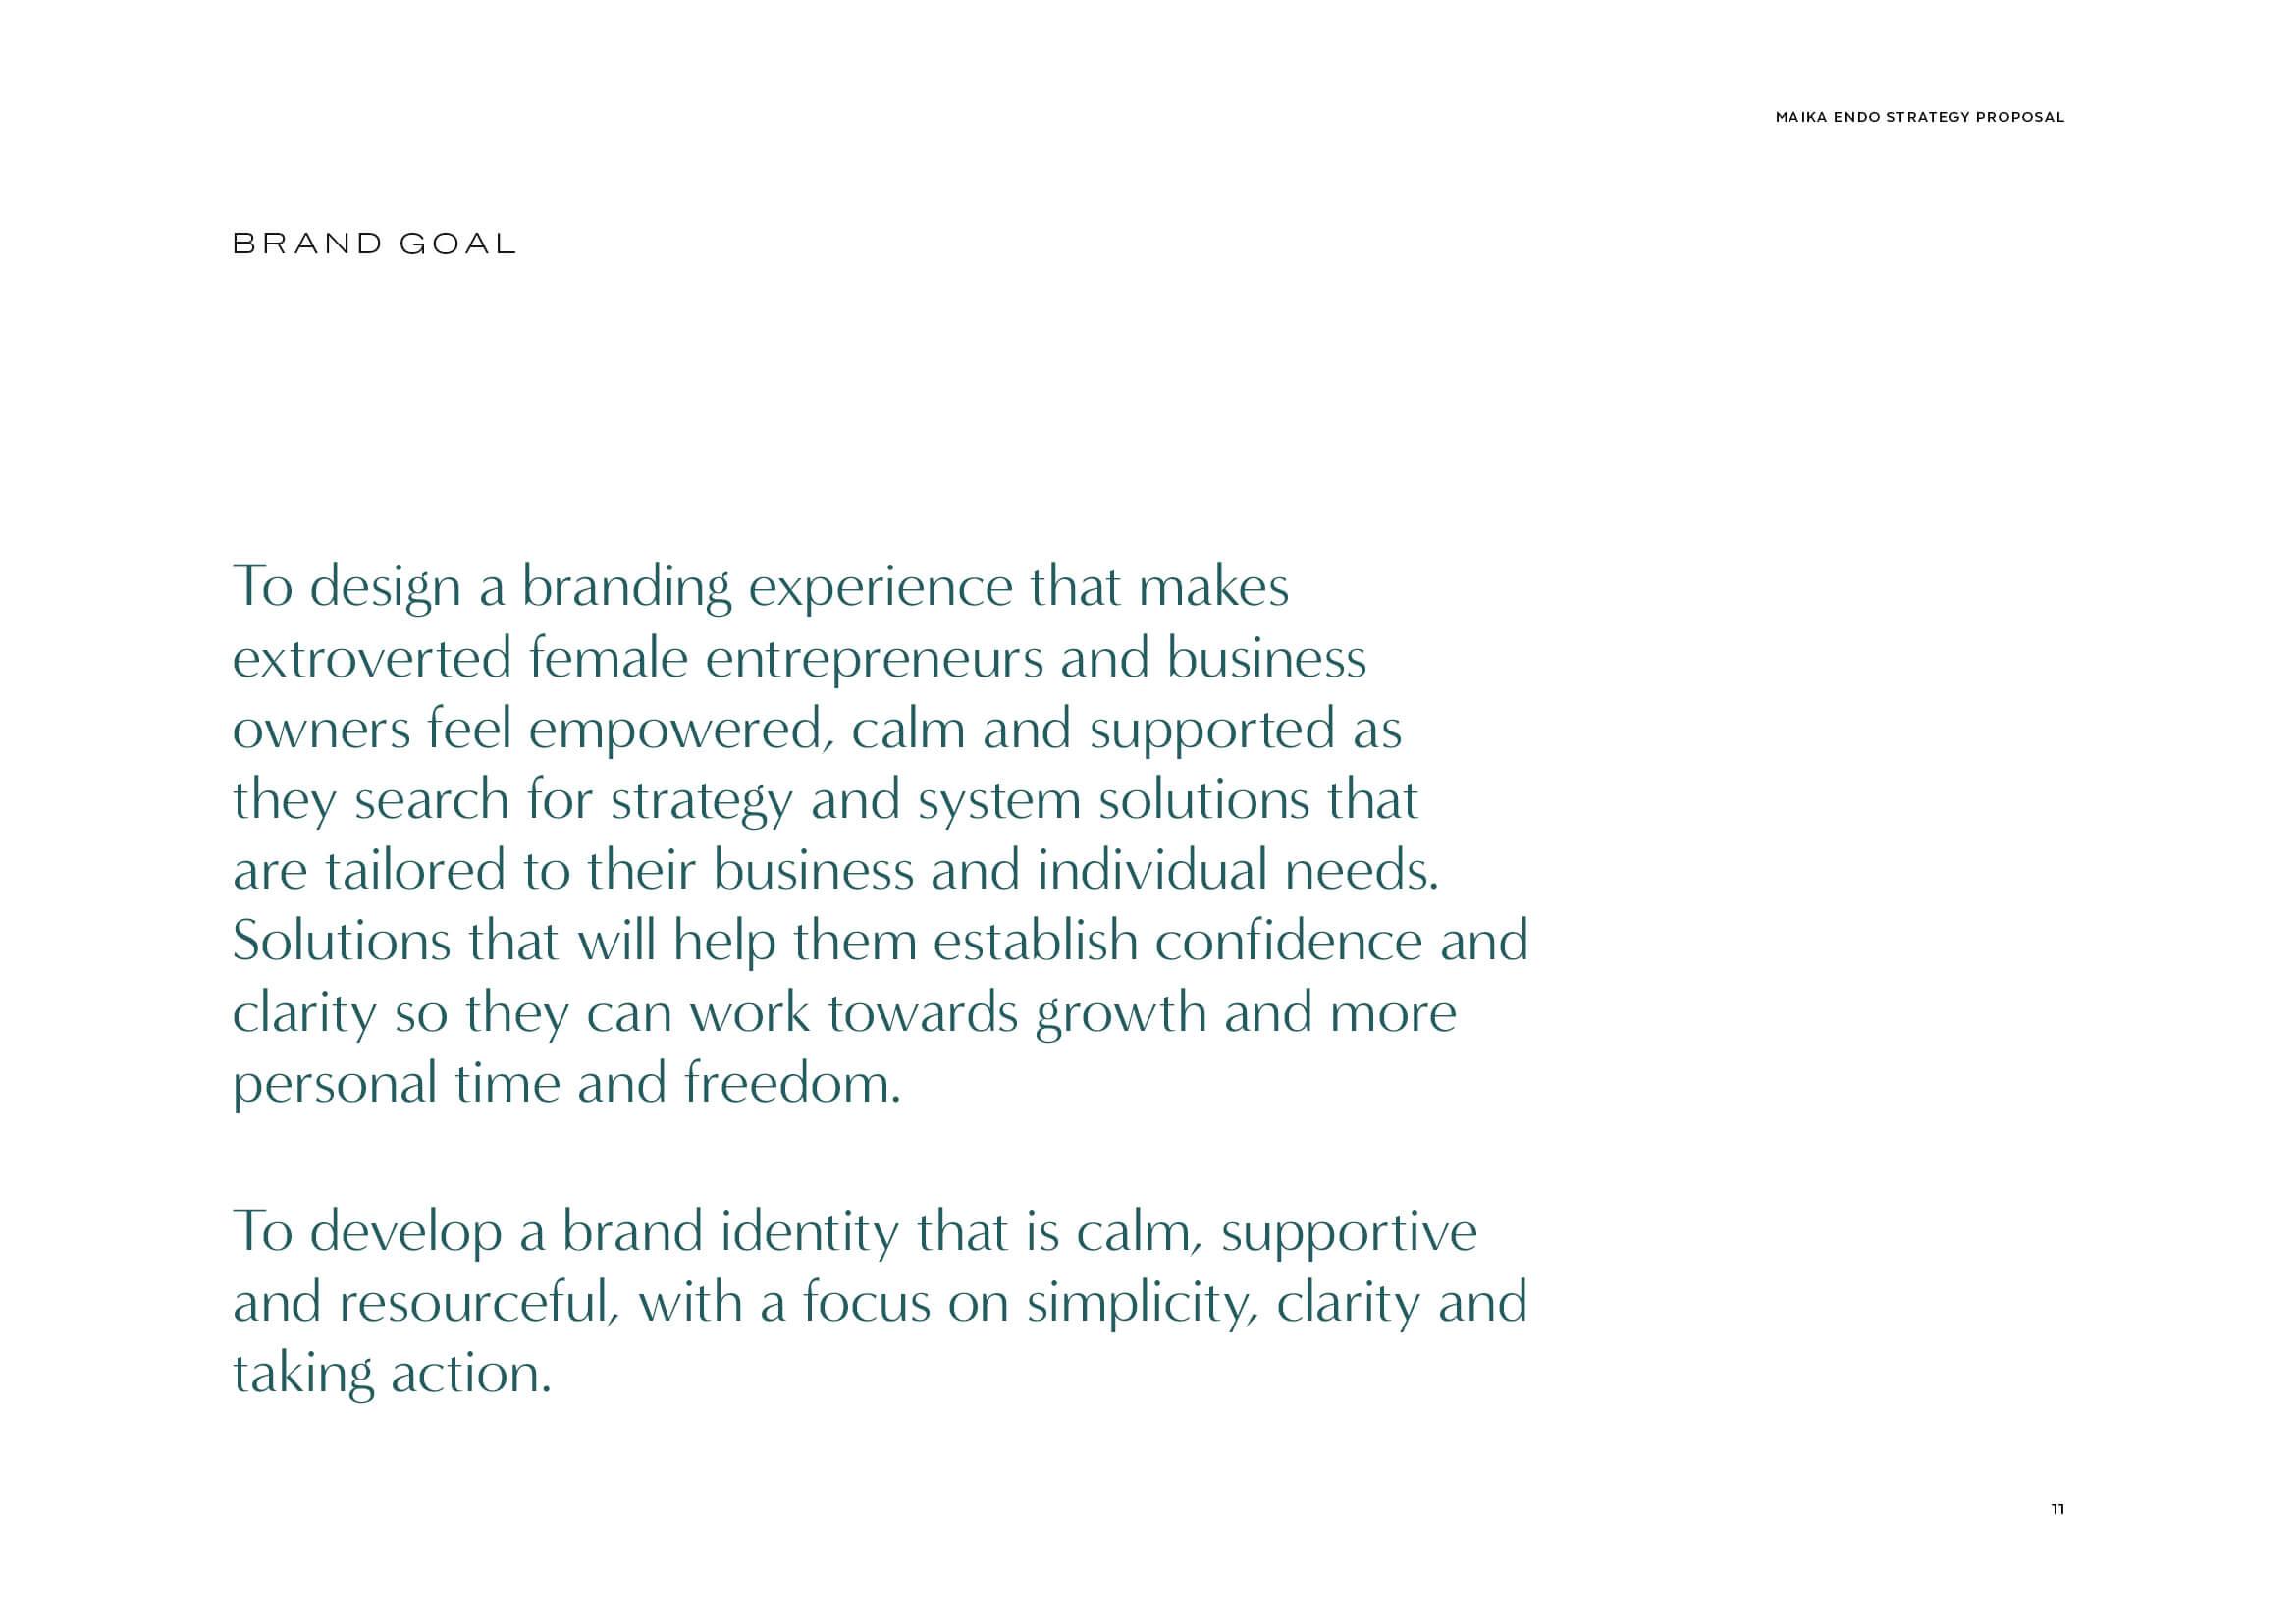 Maika Endo Strategy Proposal11.jpg